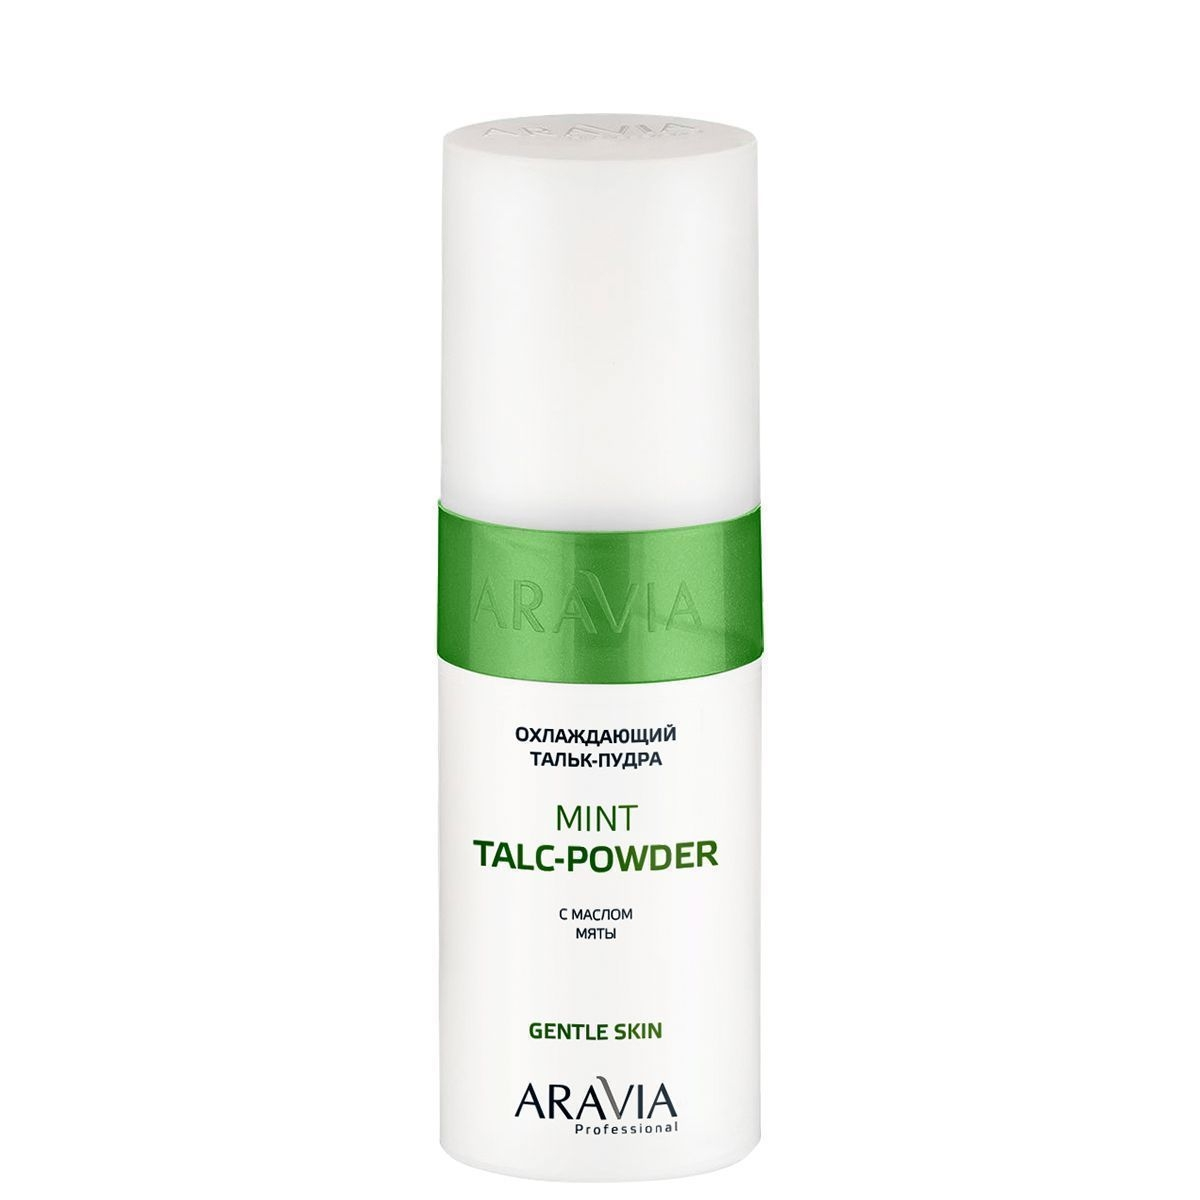 ARAVIA Тальк-Пудра Mint Talc-Powder Охлаждающий с Маслом Мяты, 150 мл